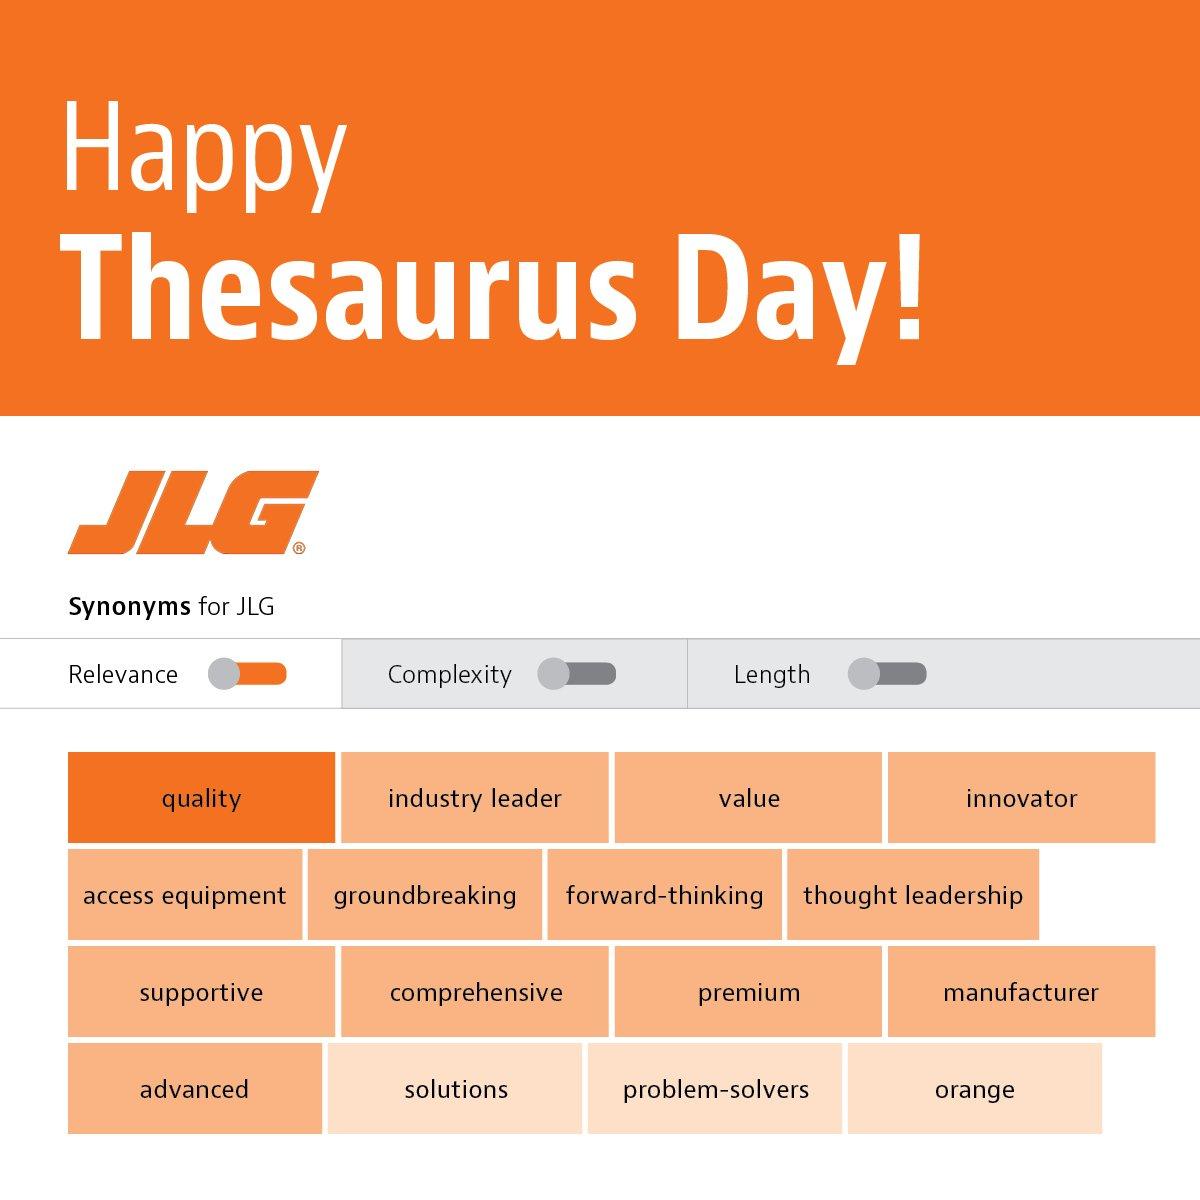 JLG Industries on Twitter: